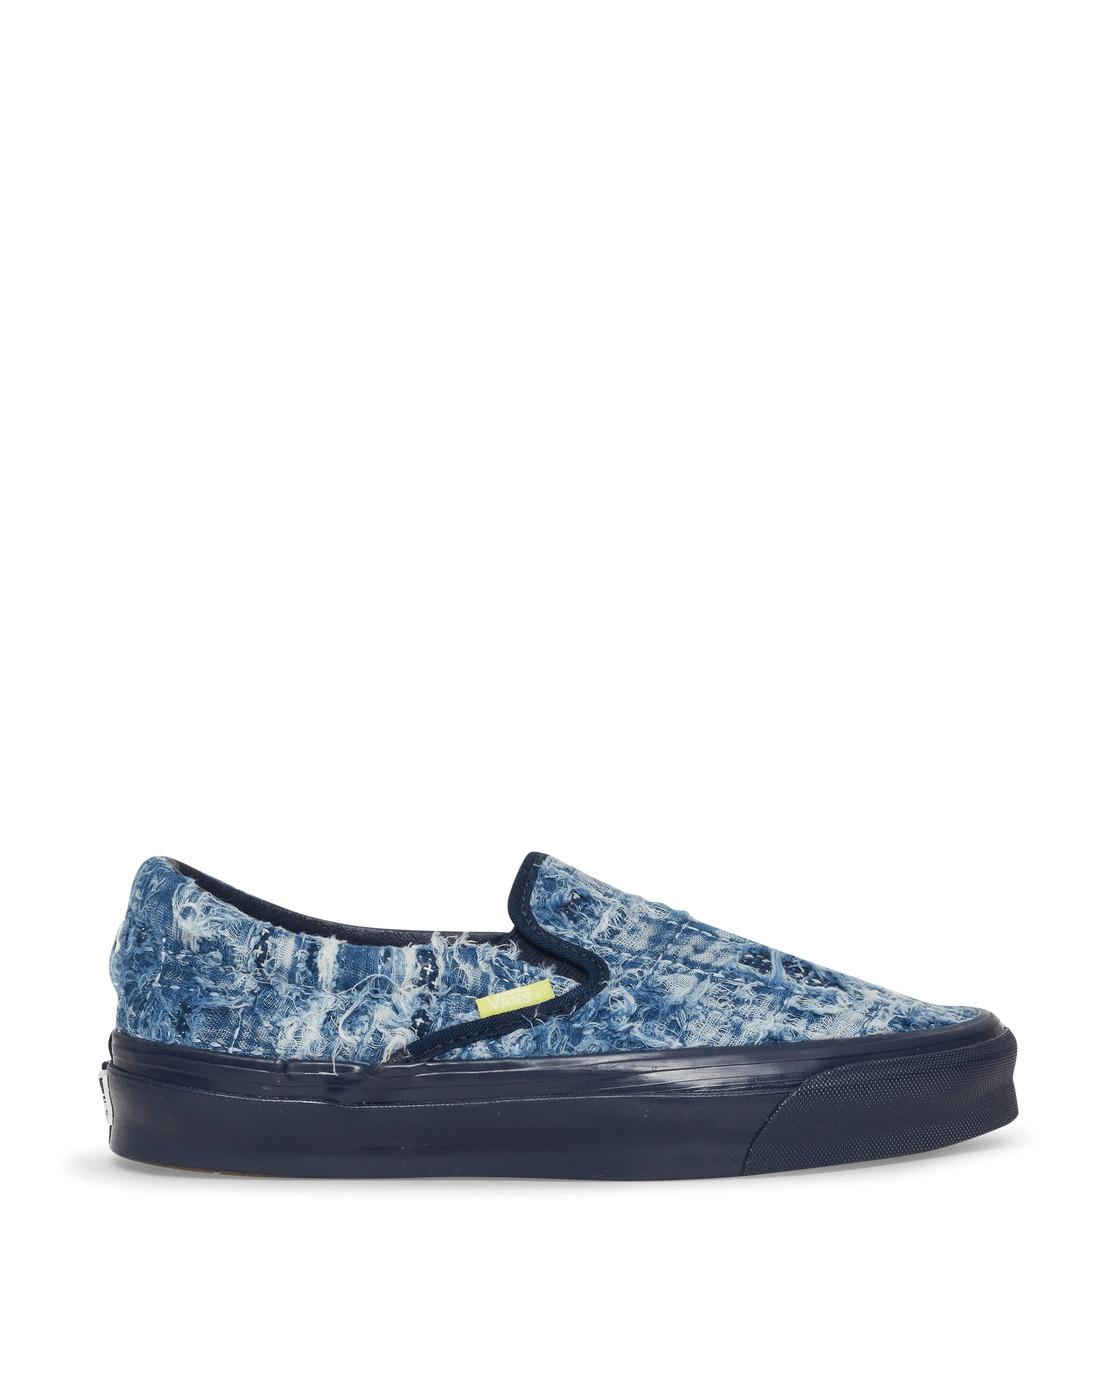 Photo: Vans Fdmtl Og Classic Slip On Lx Sneakers Indigo/Distressed